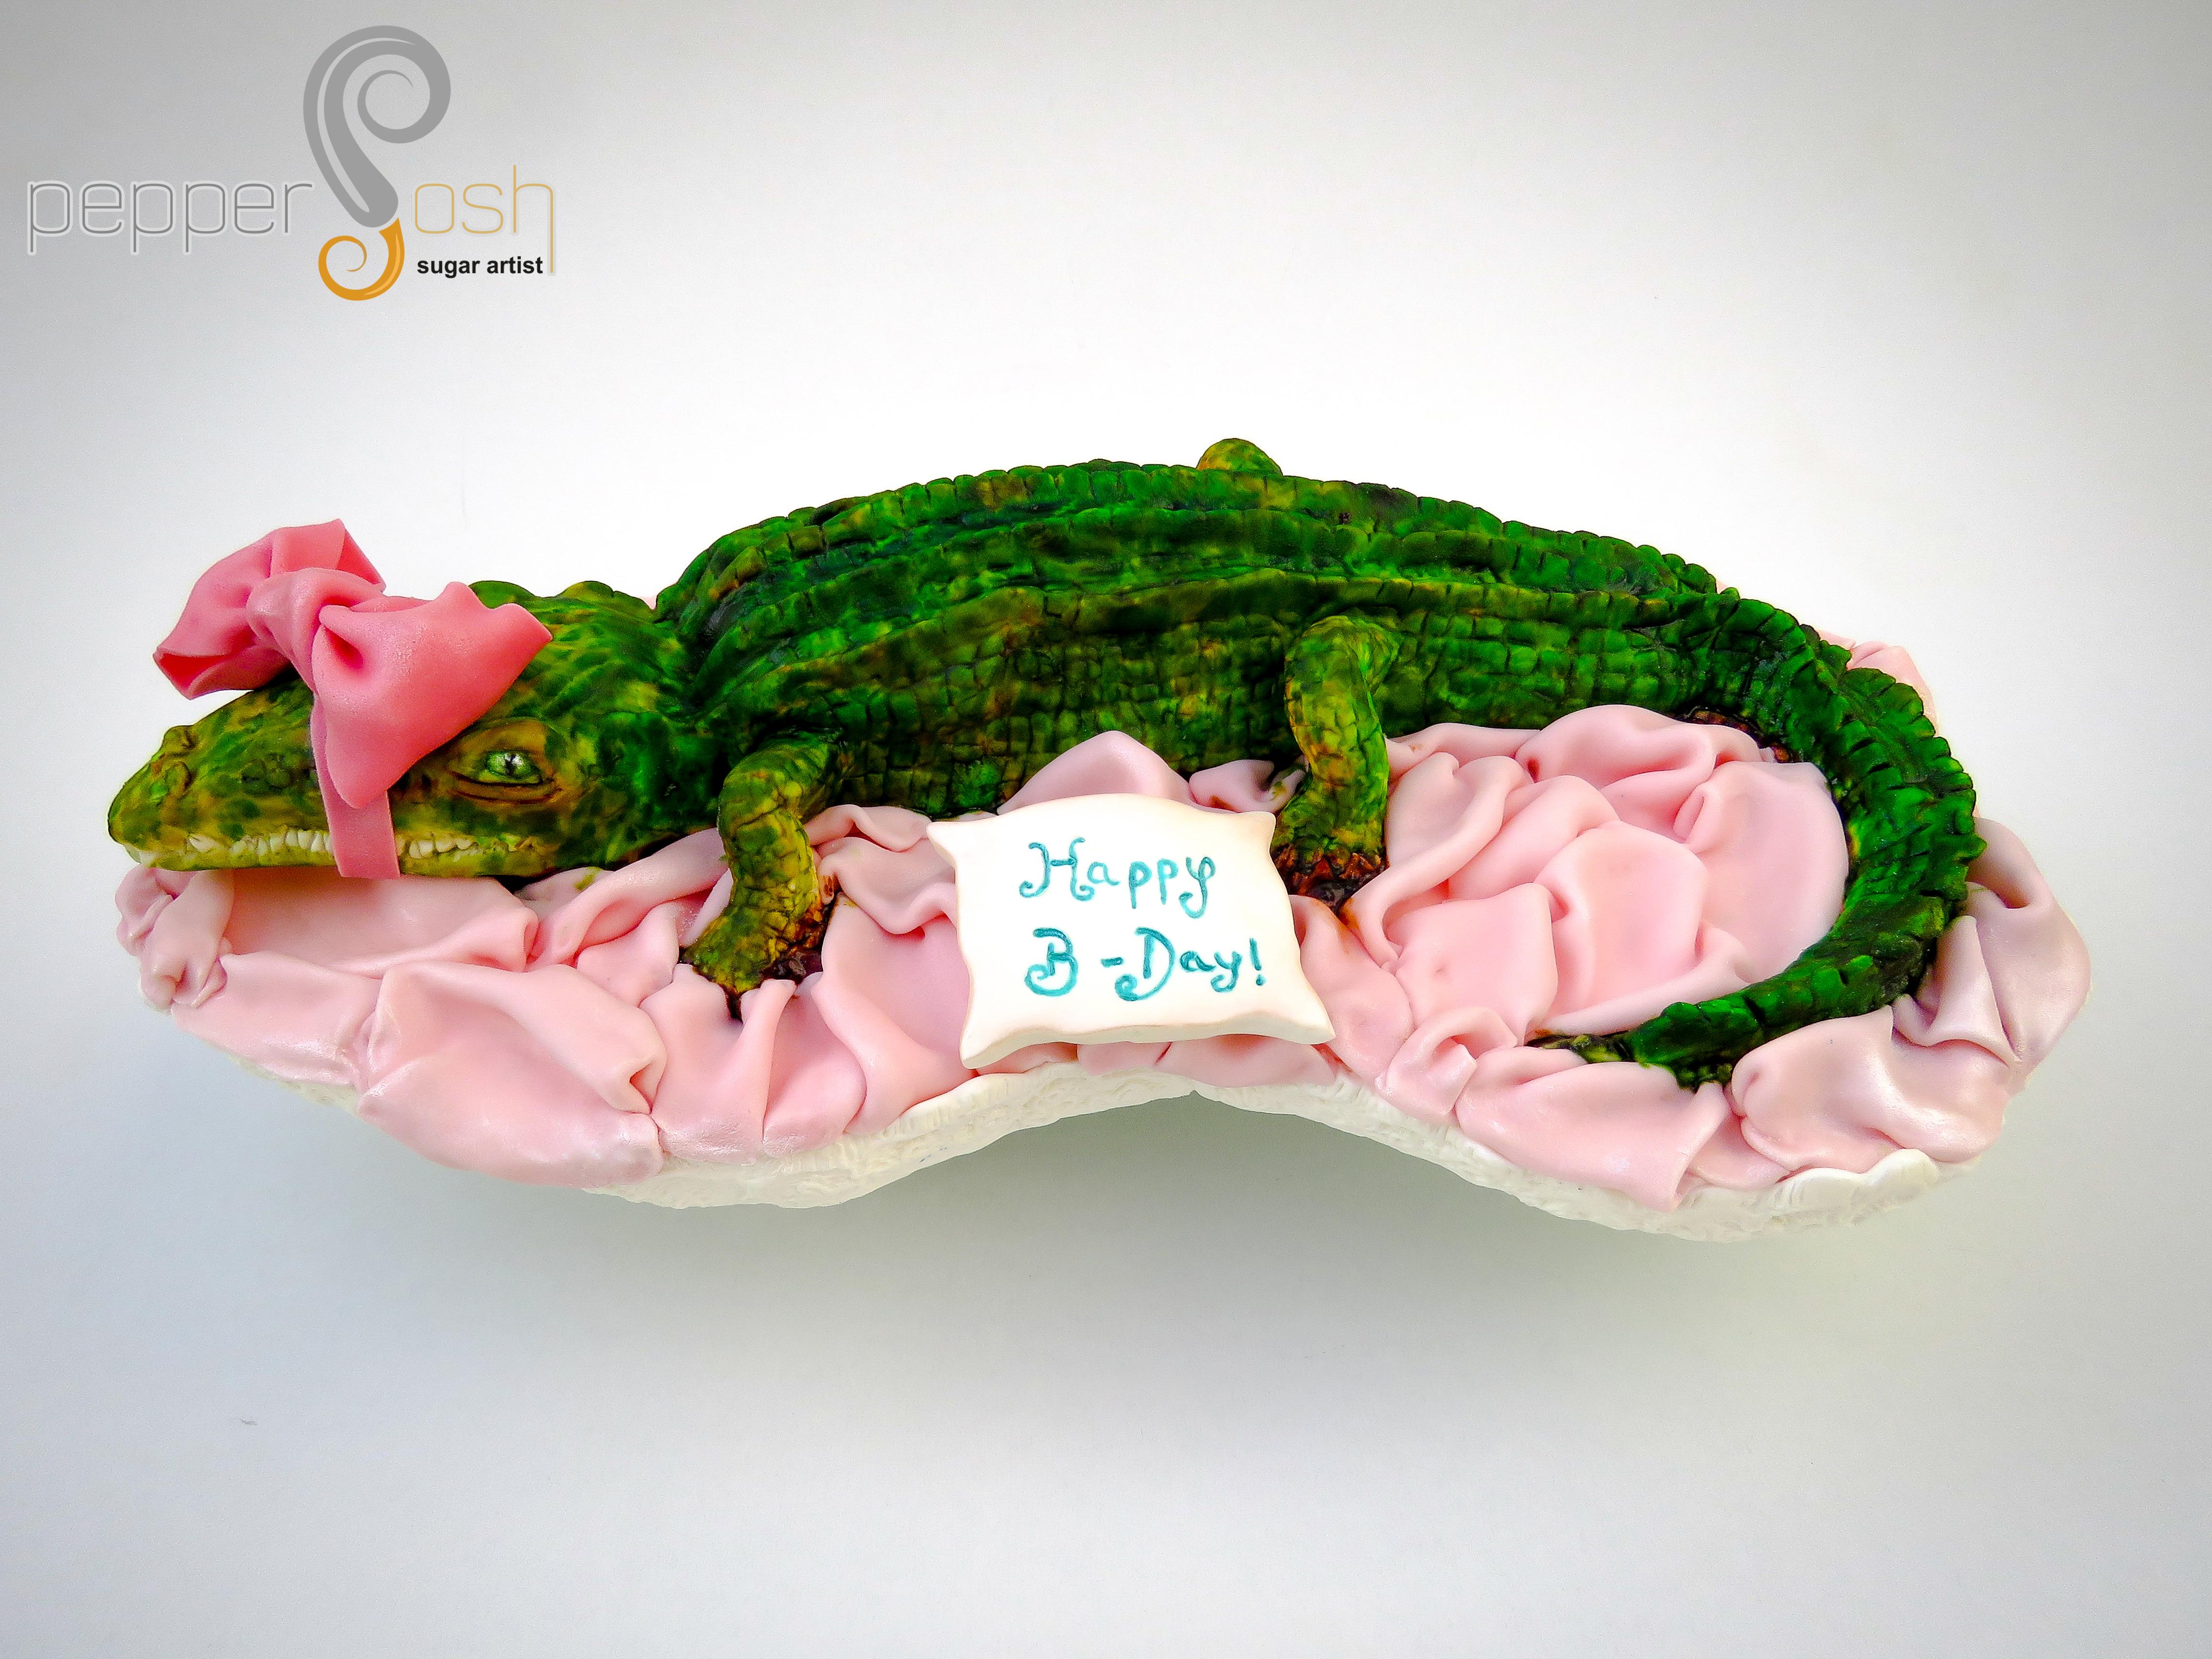 Animal-Rights-Carla-Rodrigues-Pepper-Posh-Sugar-Artist-Crocodile.jpg#asset:13714